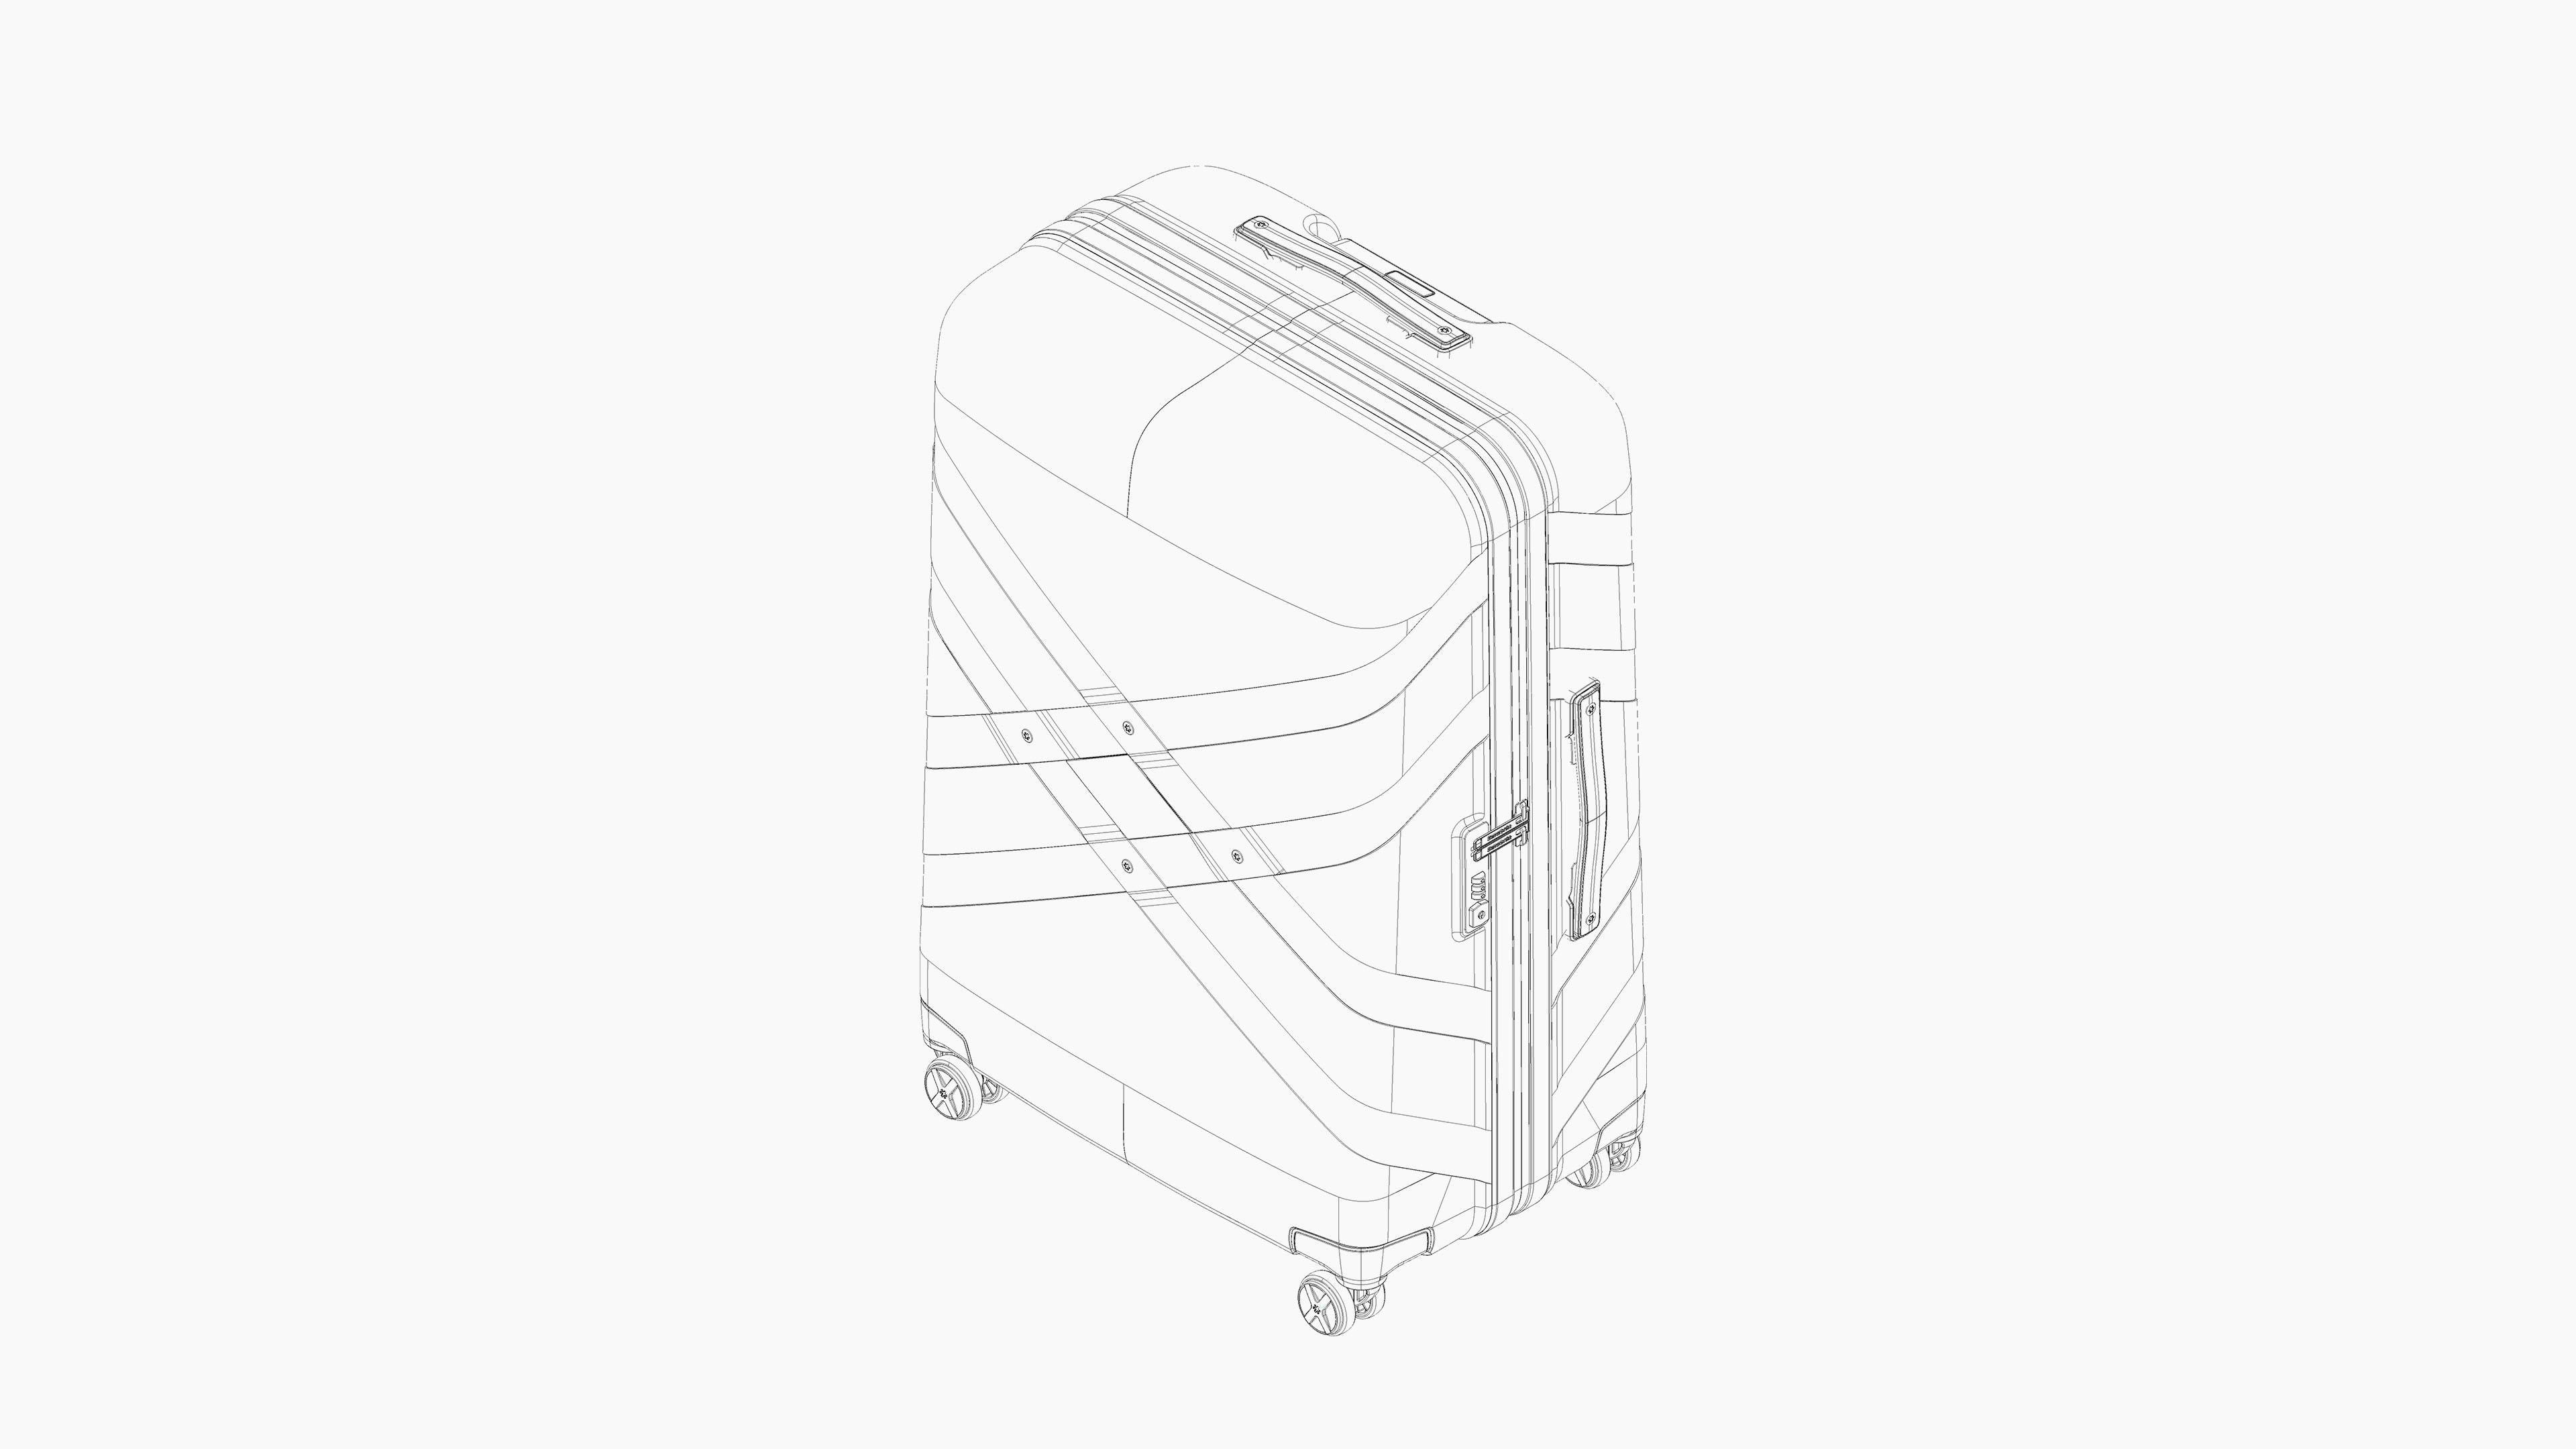 4K Gallery Samsonite 3D Lineart